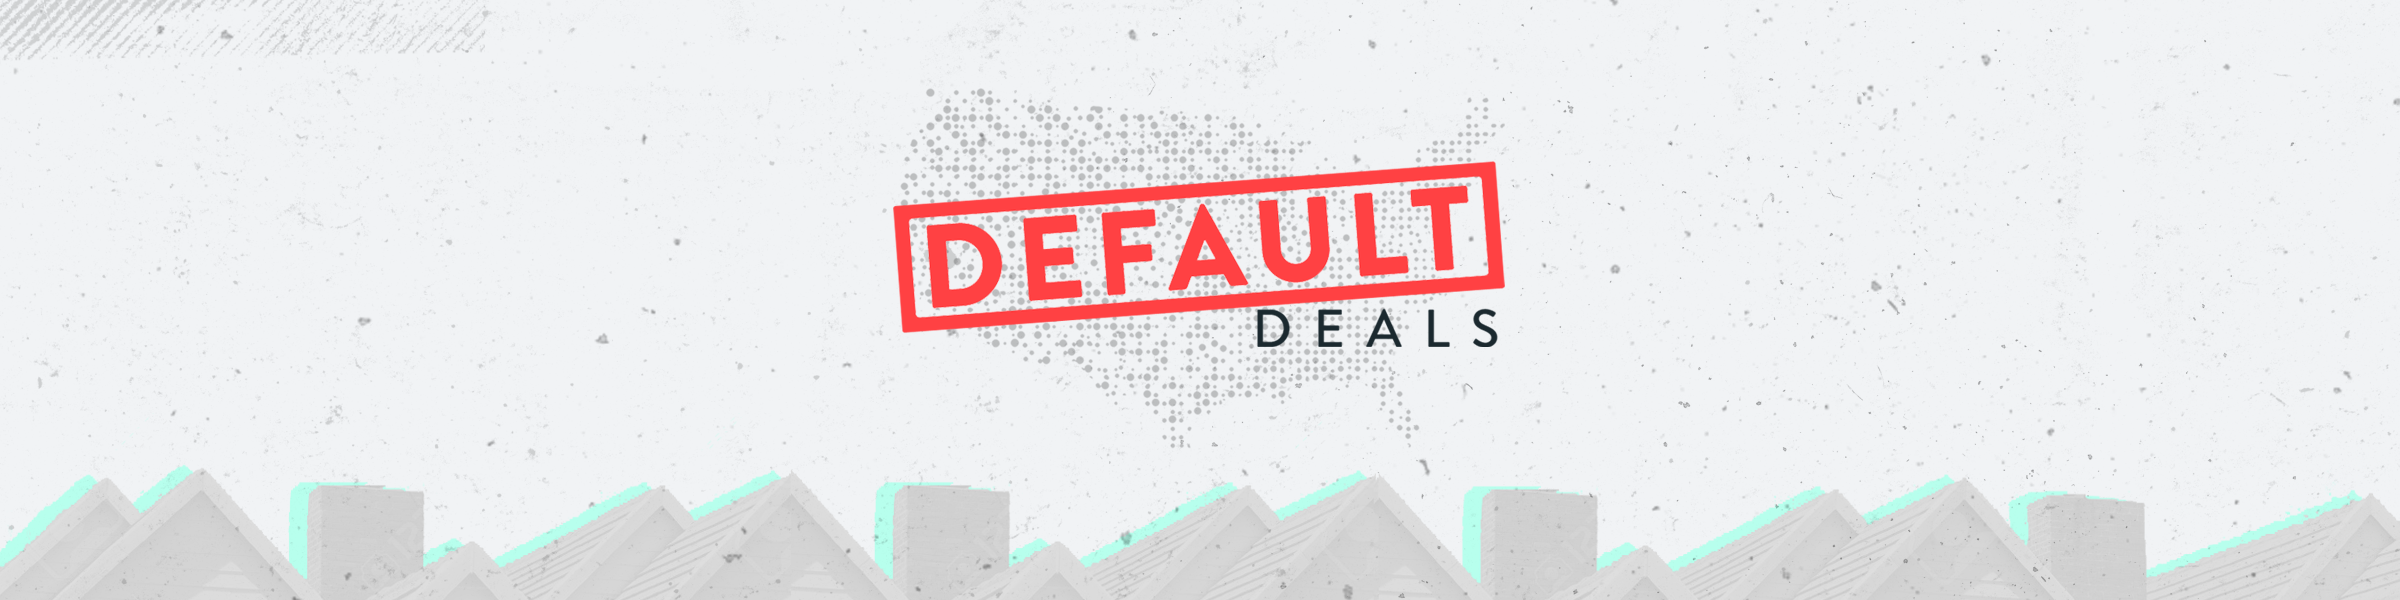 "Announcing: ""Default Deals"" by Peter Vekselman & Julie Muse"